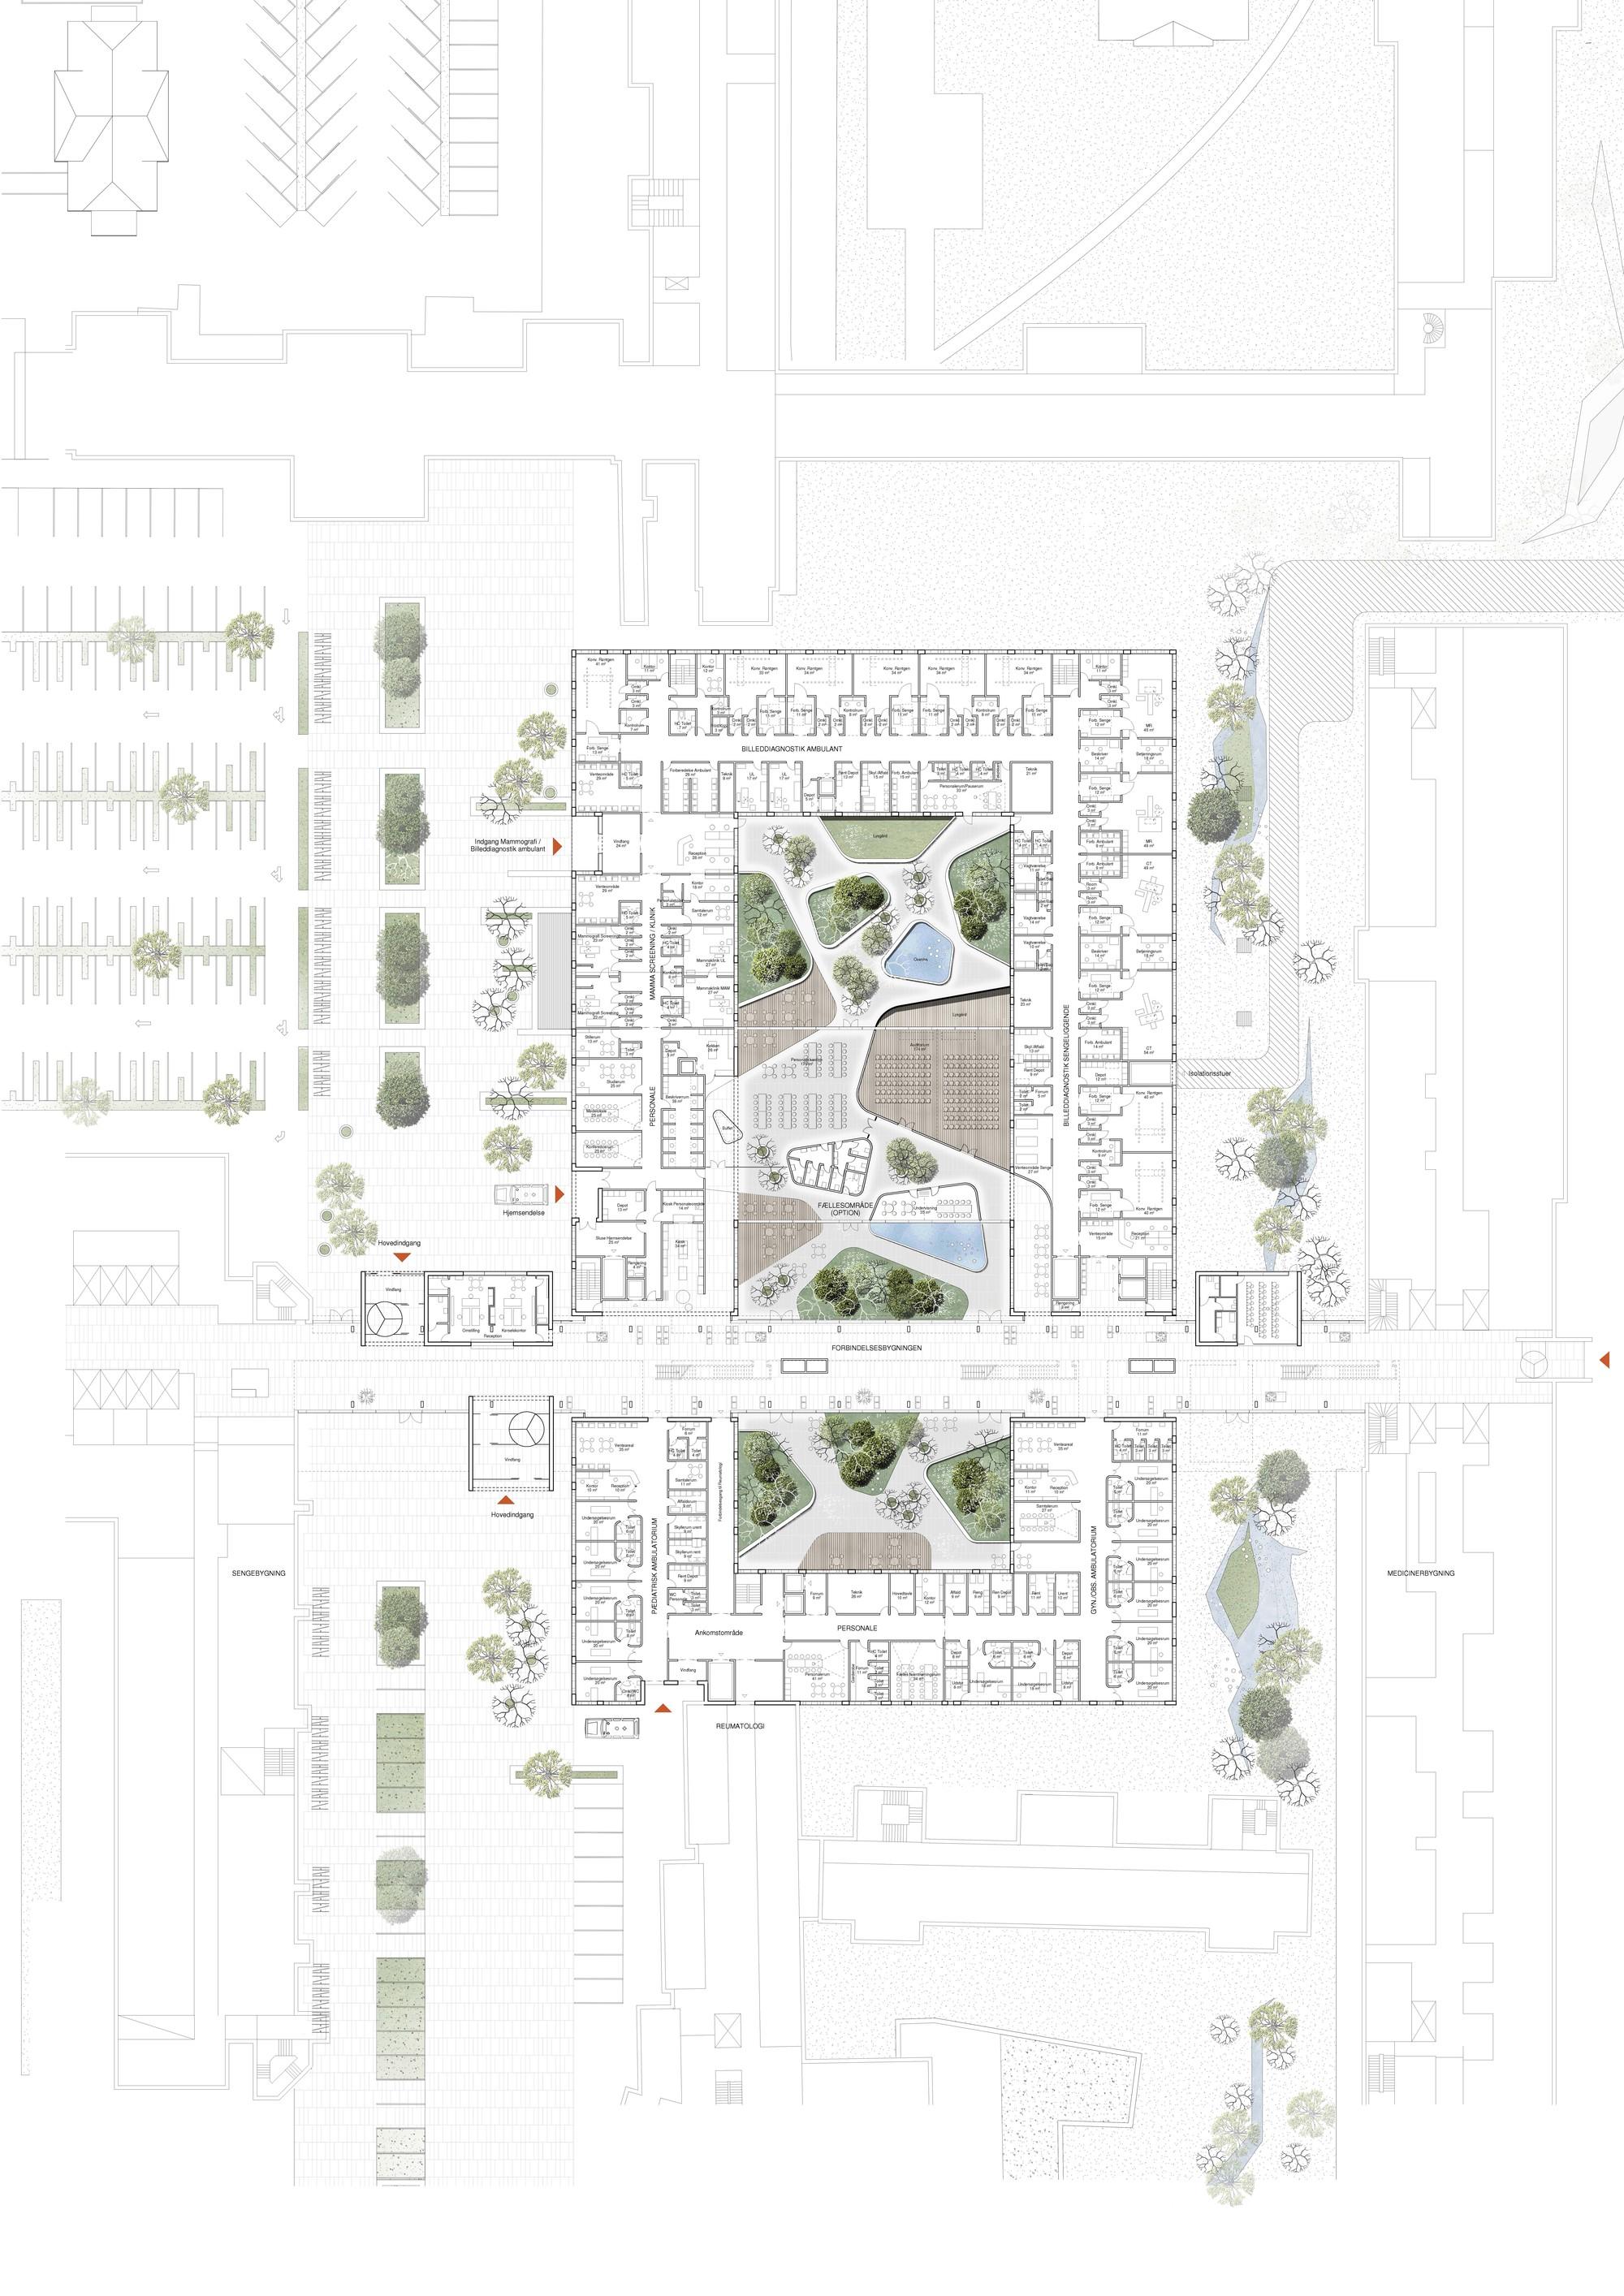 Maternity Hospital Floor Plan Maternity Hospital Floor Plan Floor Plan Hospital Design